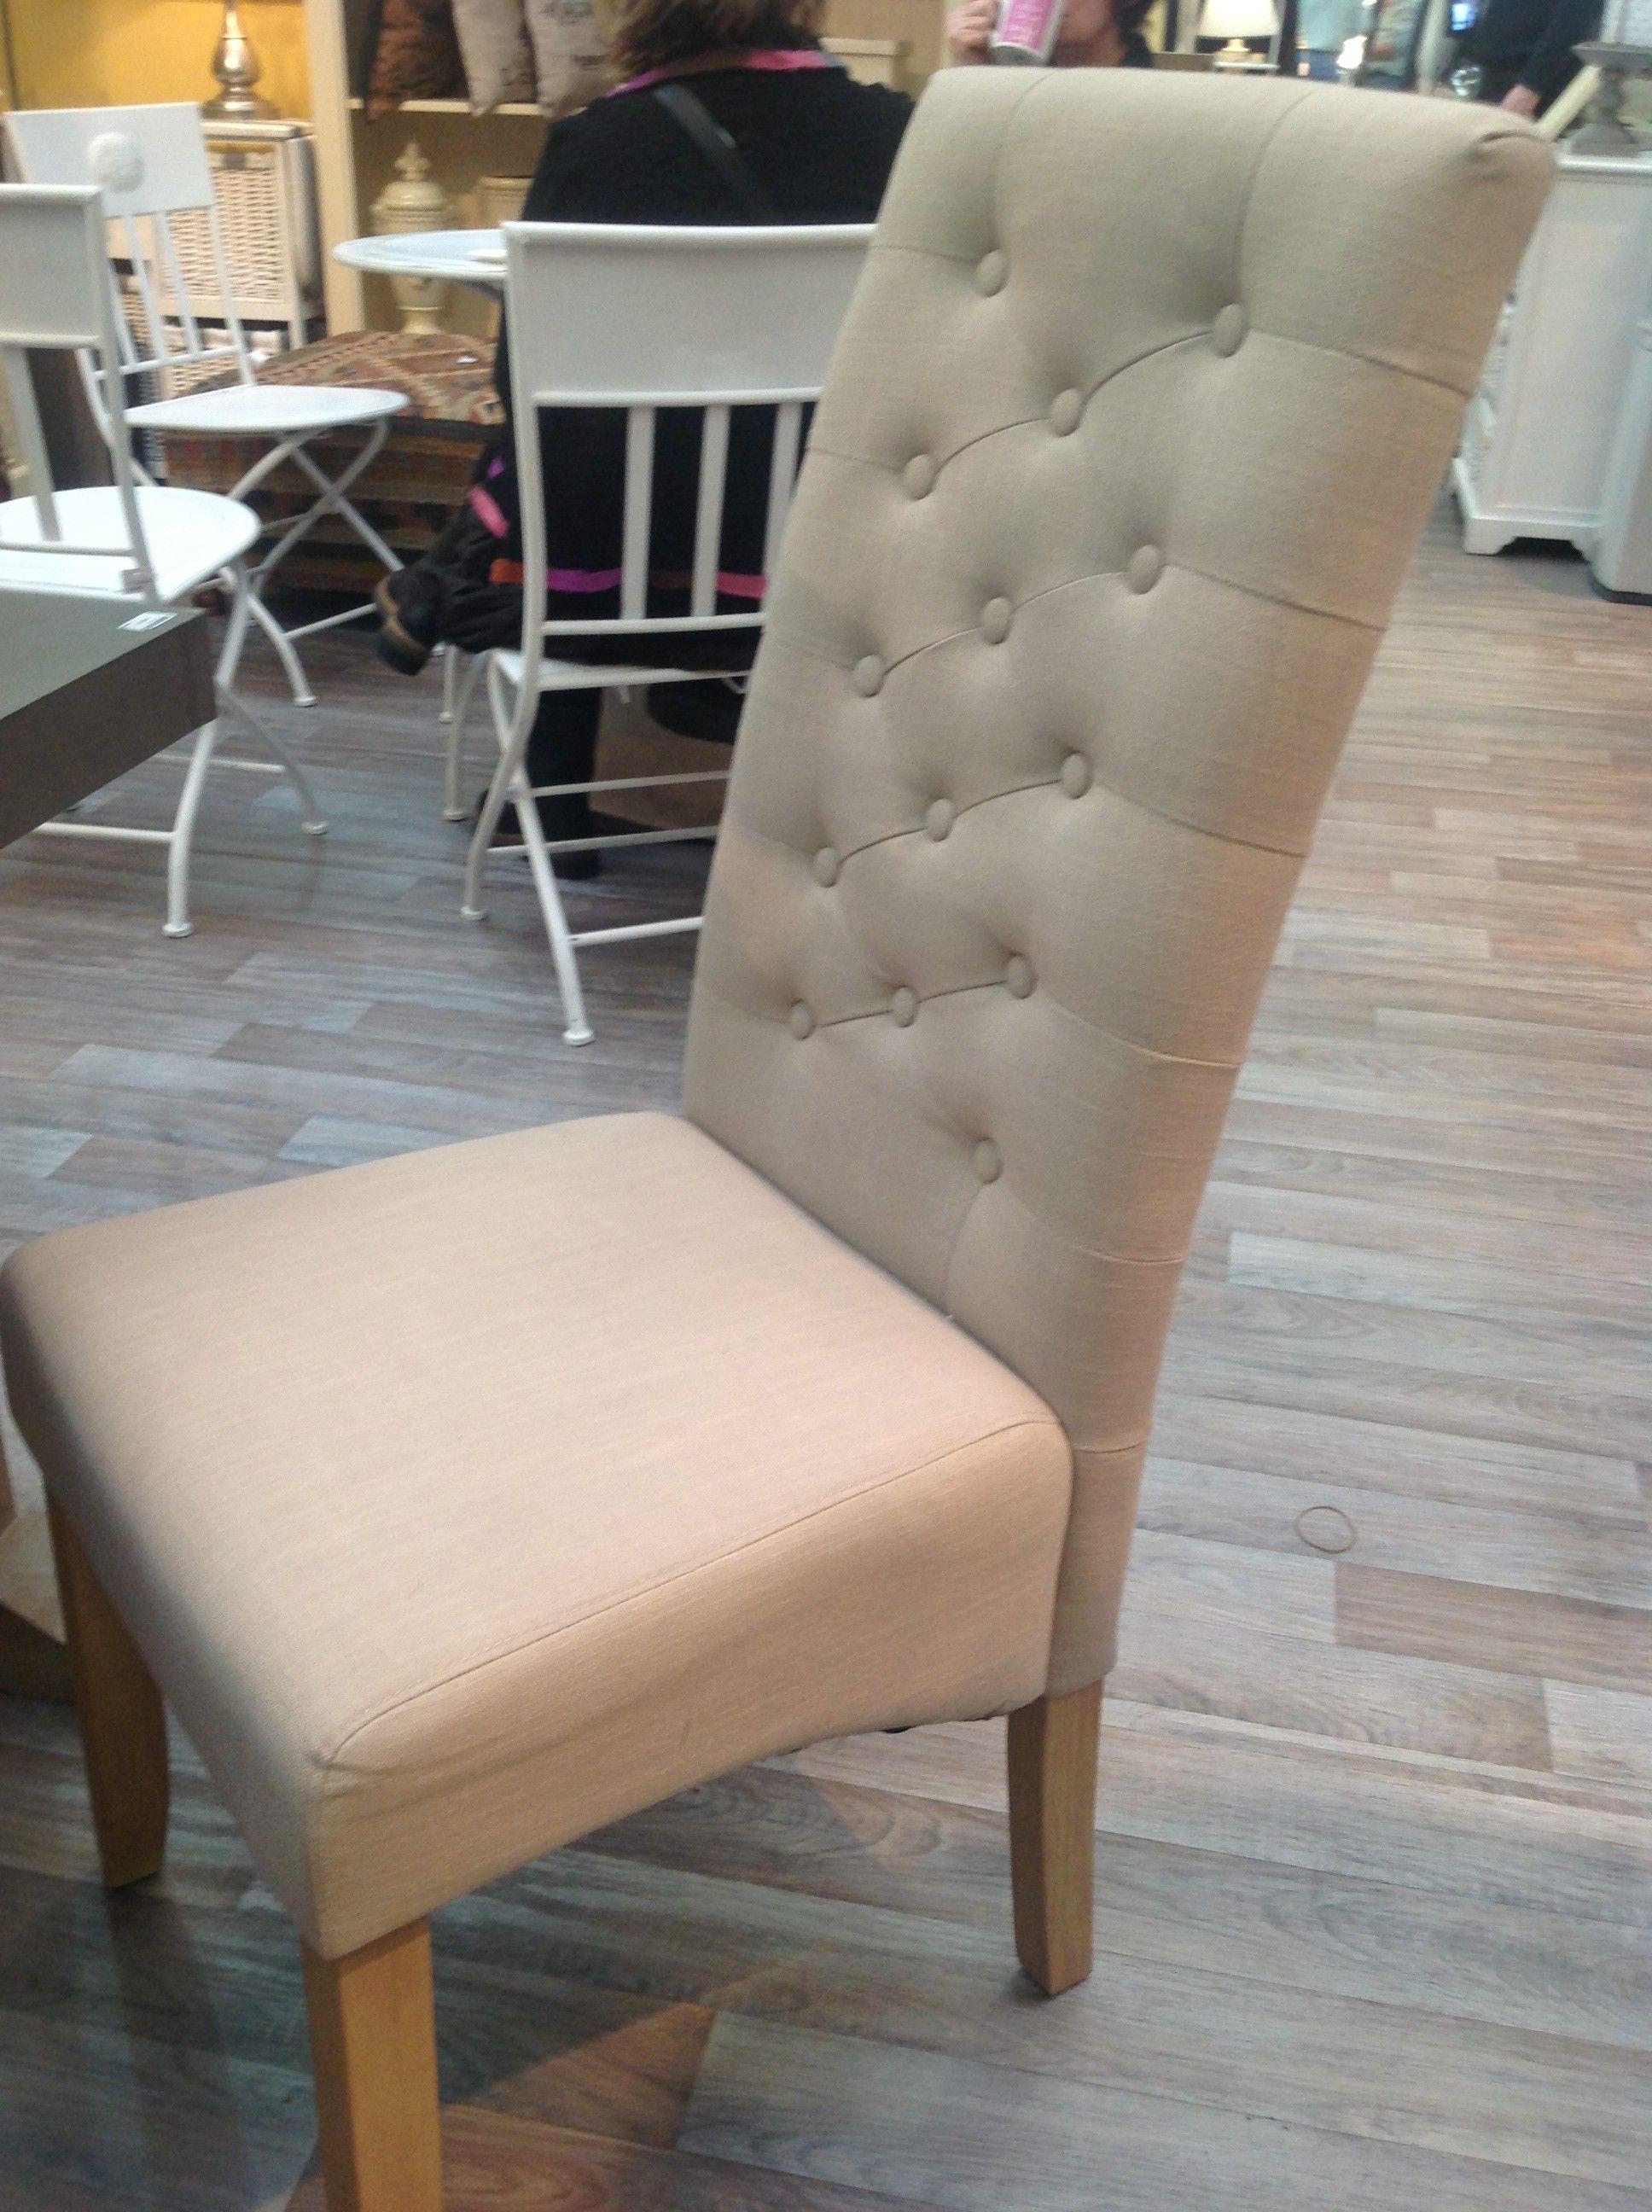 auckland holz sofa entwürfe bilder holz möbel design katalog